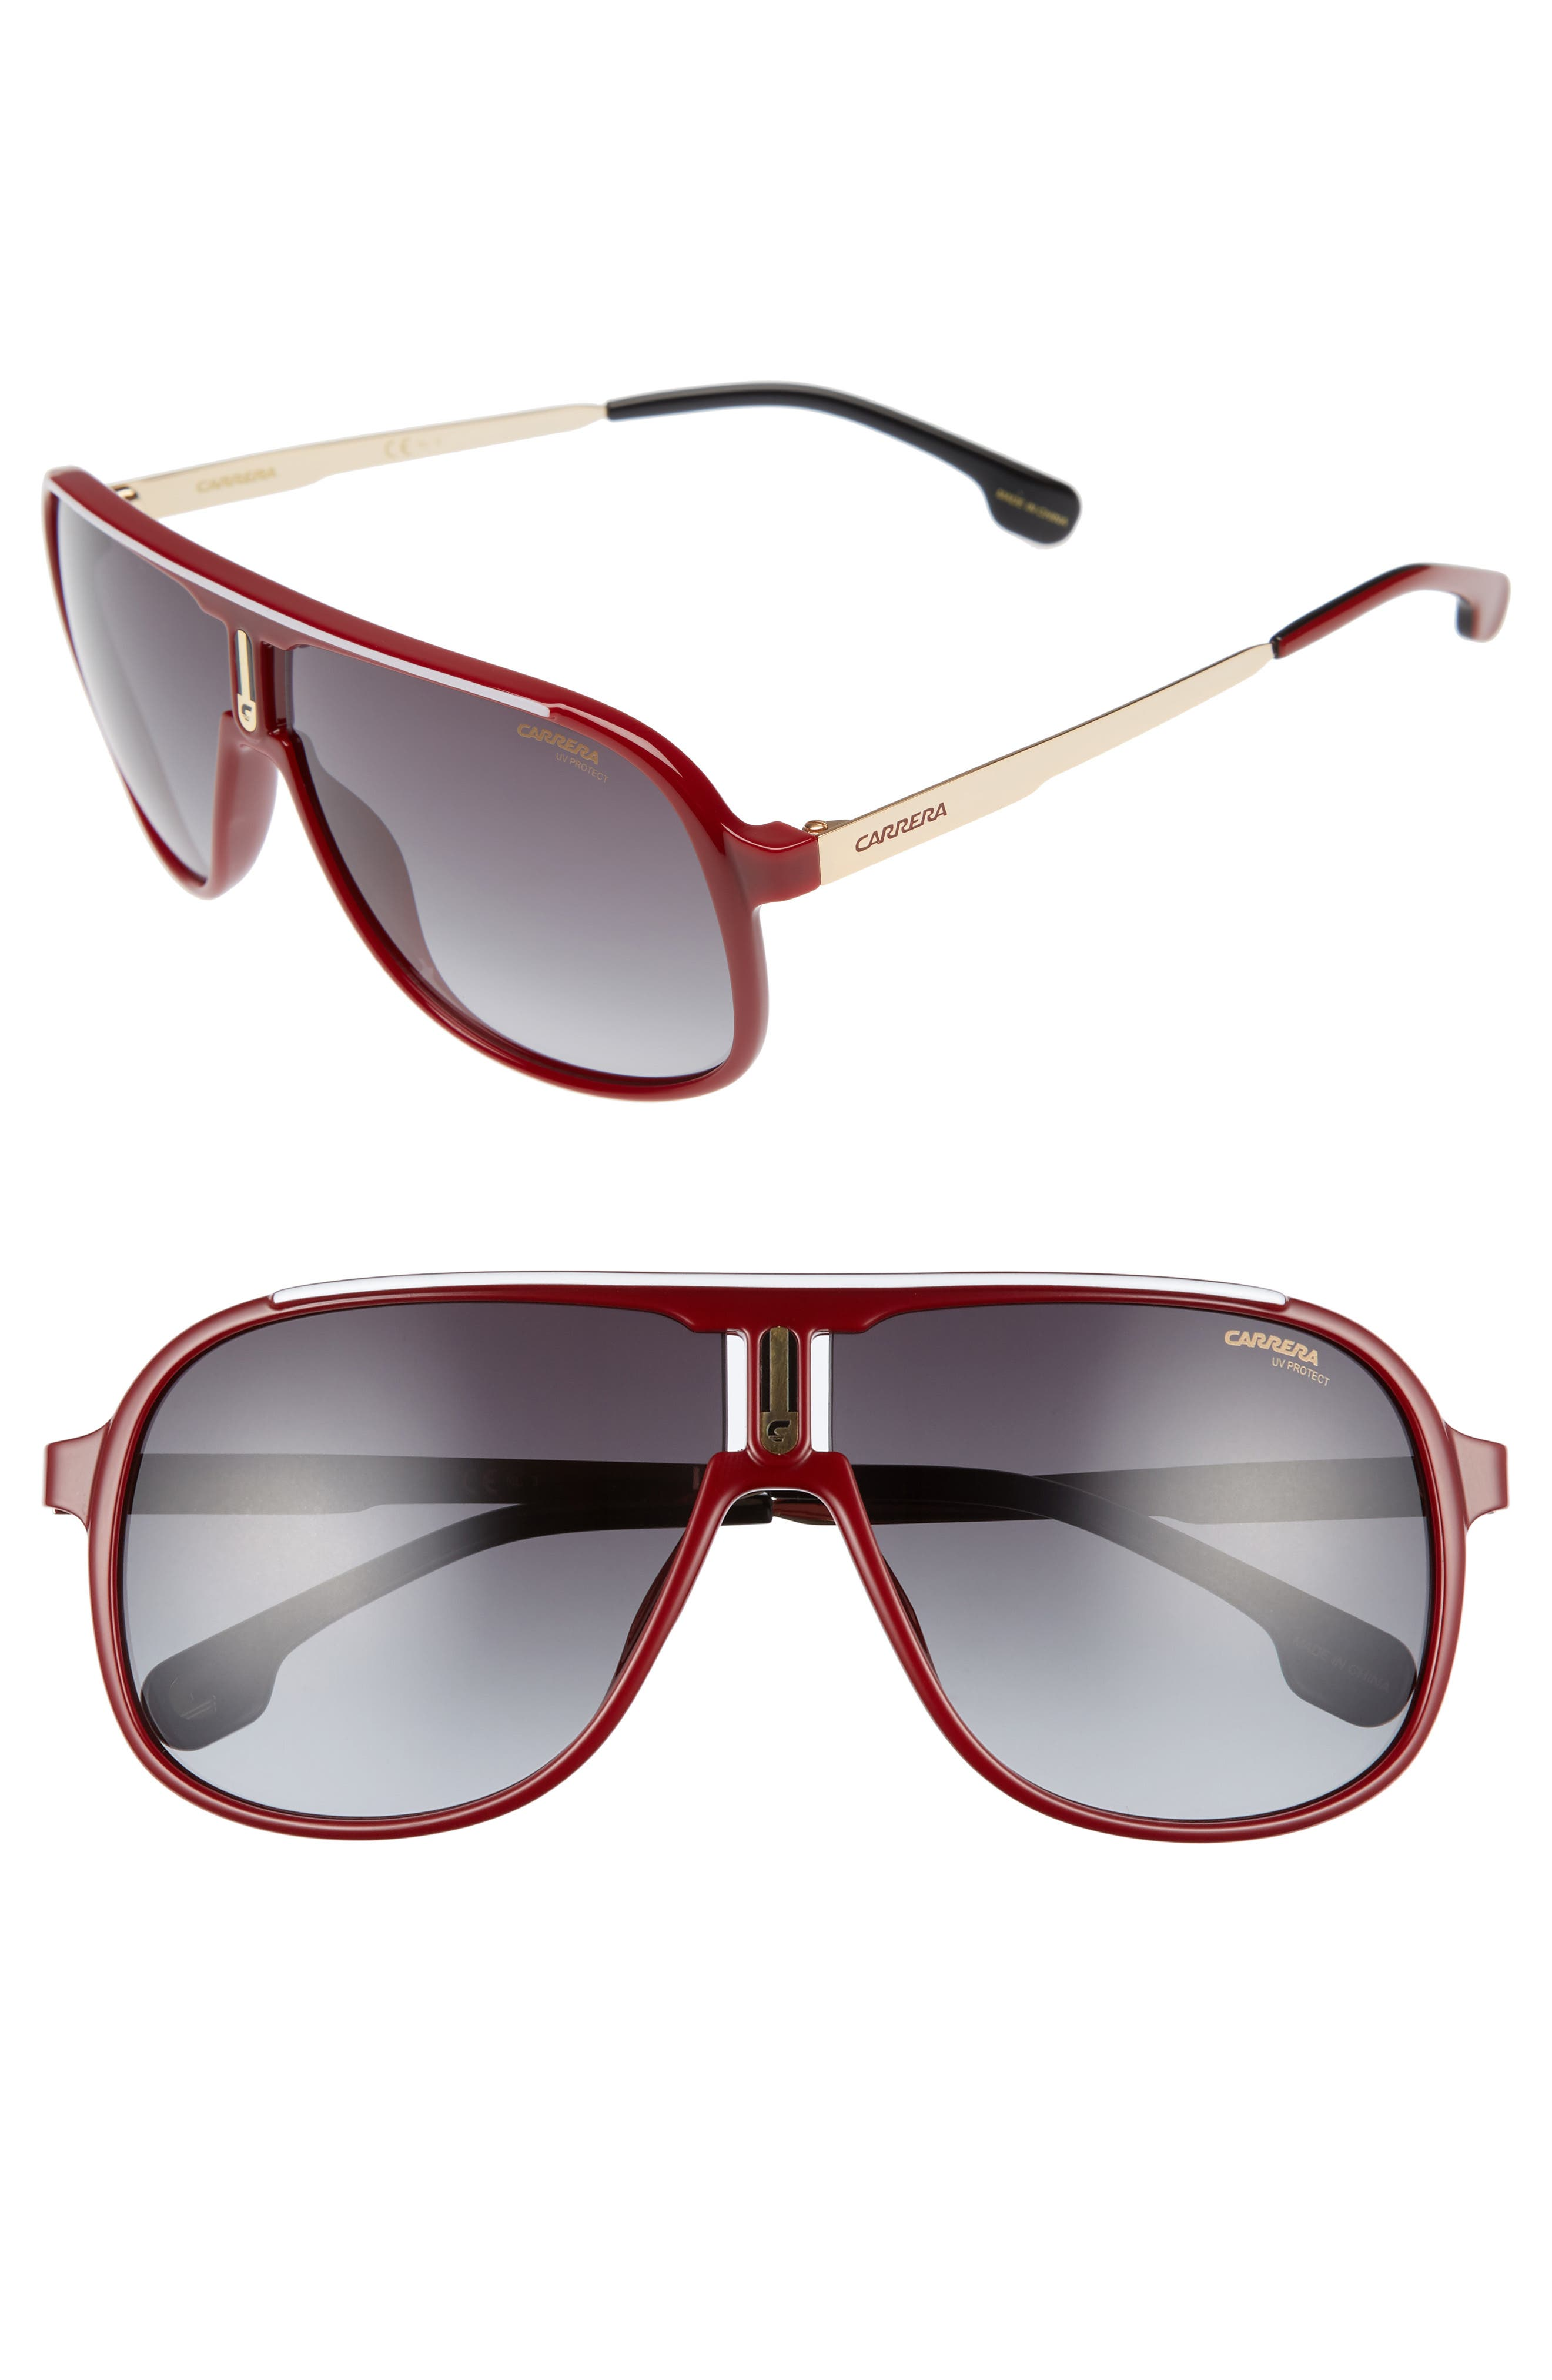 Carrera Eyewear 62mm Sunglasses